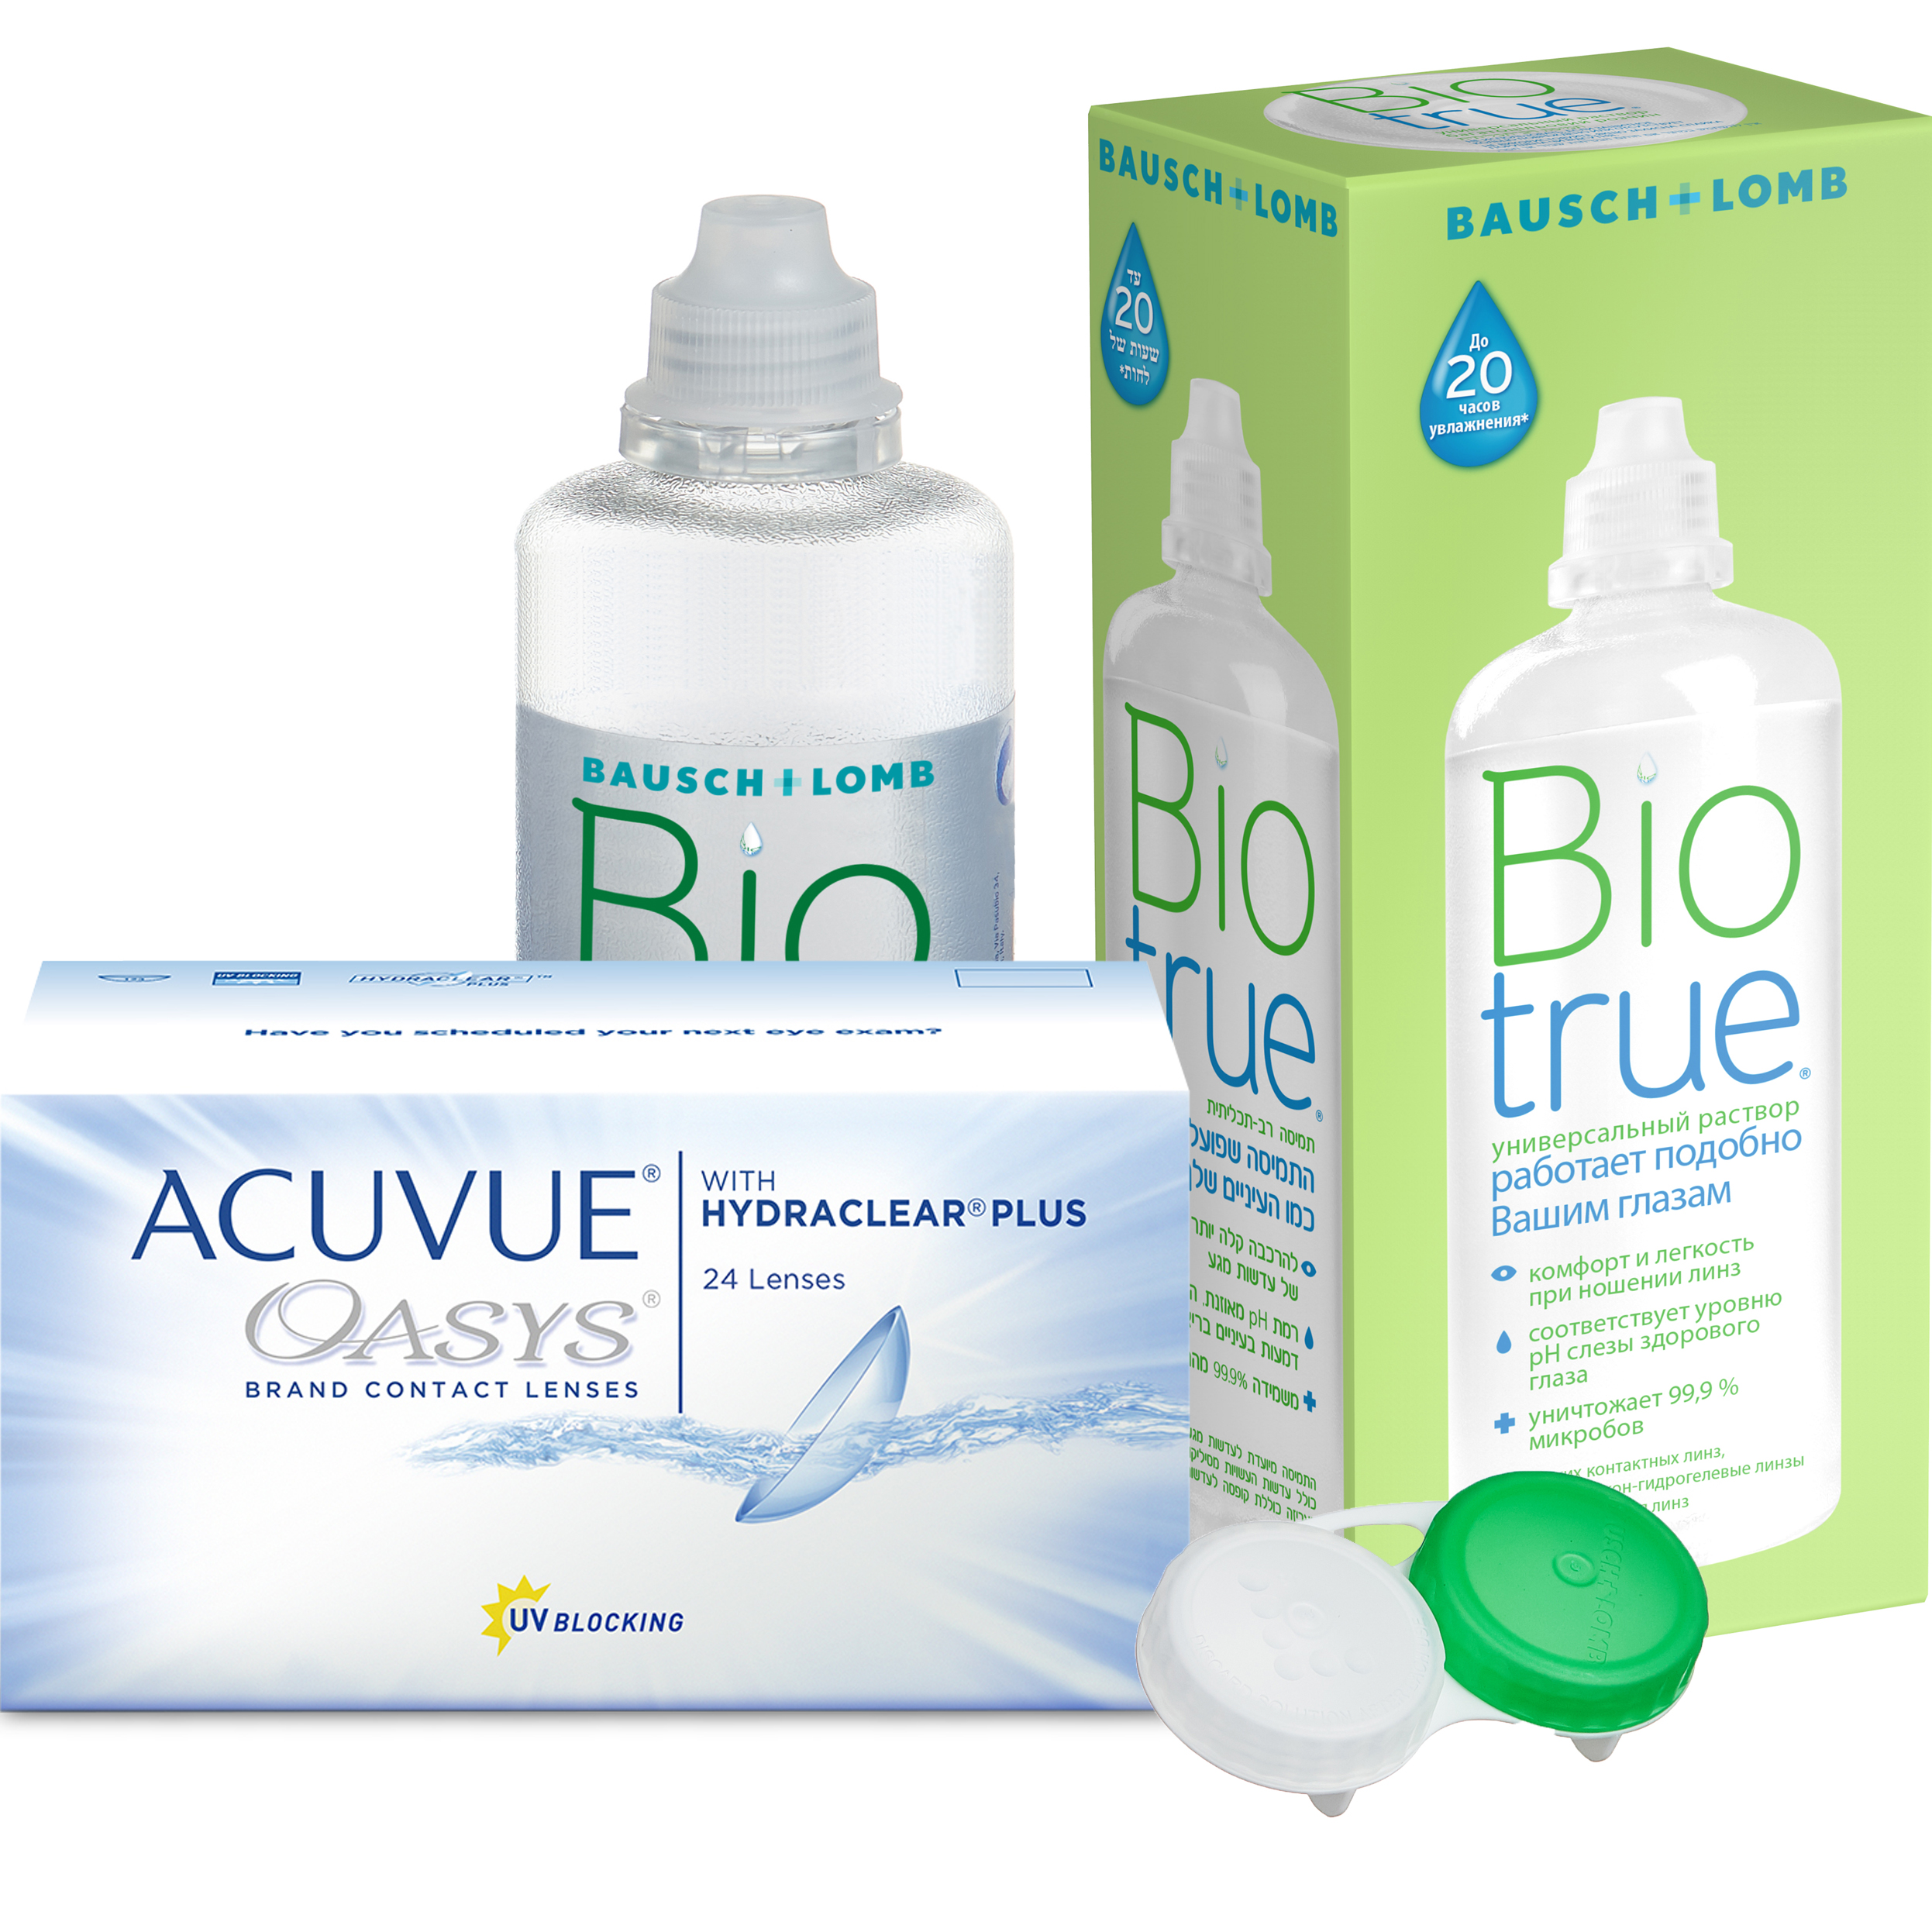 Купить Oasys with Hydraclear Plus 24 линзы + Biotrue, Контактные линзы Acuvue Oasys with Hydraclear Plus 24 линзы R 8.4 +7, 50 + Biotrue 300 мл